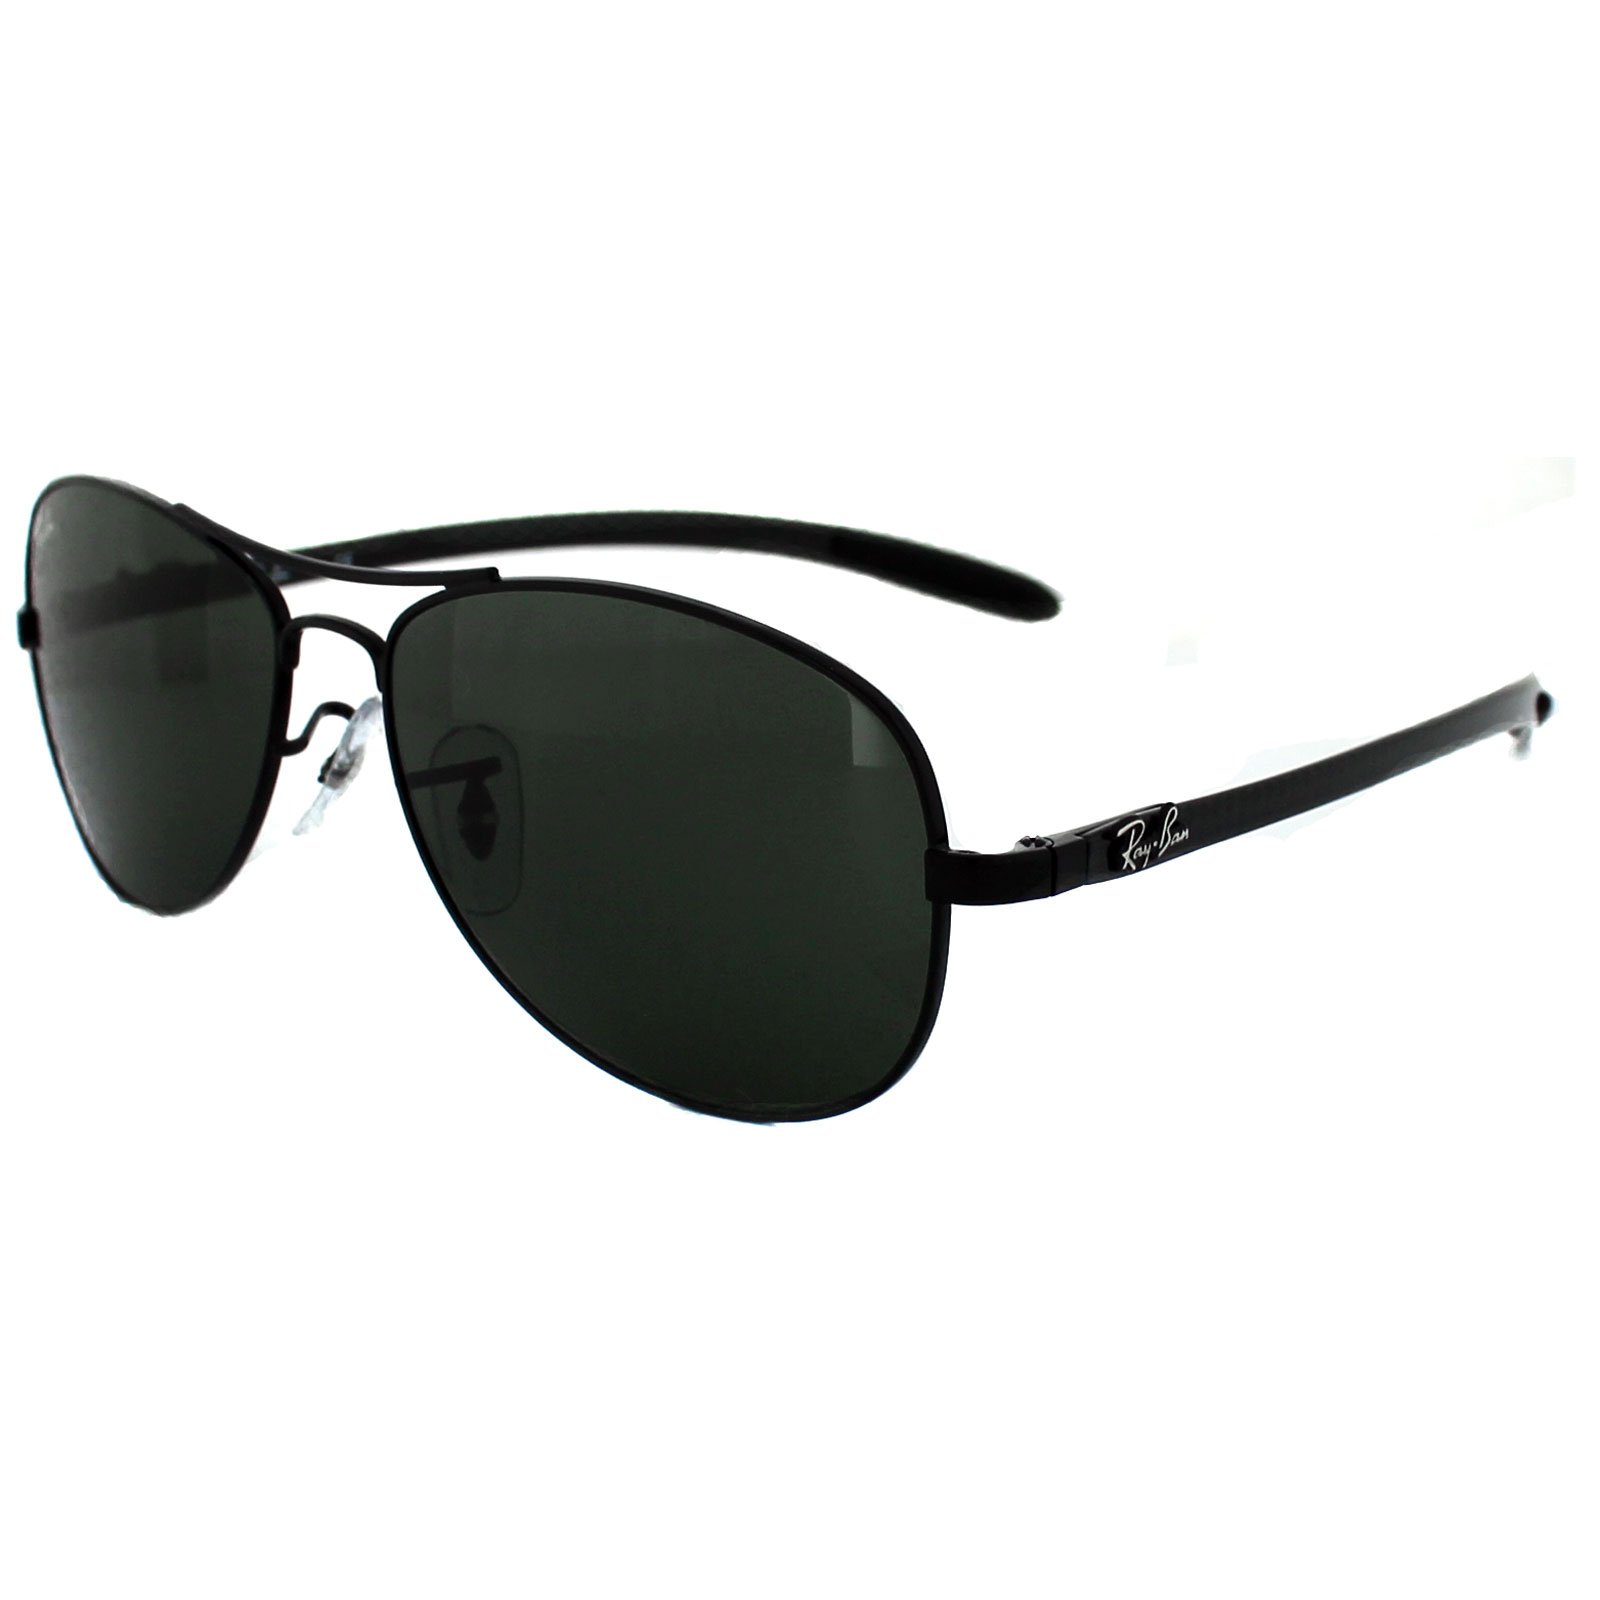 4f44d9be3f Ban Sunglasses Heritage Uk Ebay Malta « Ray qOxEOnPt. «